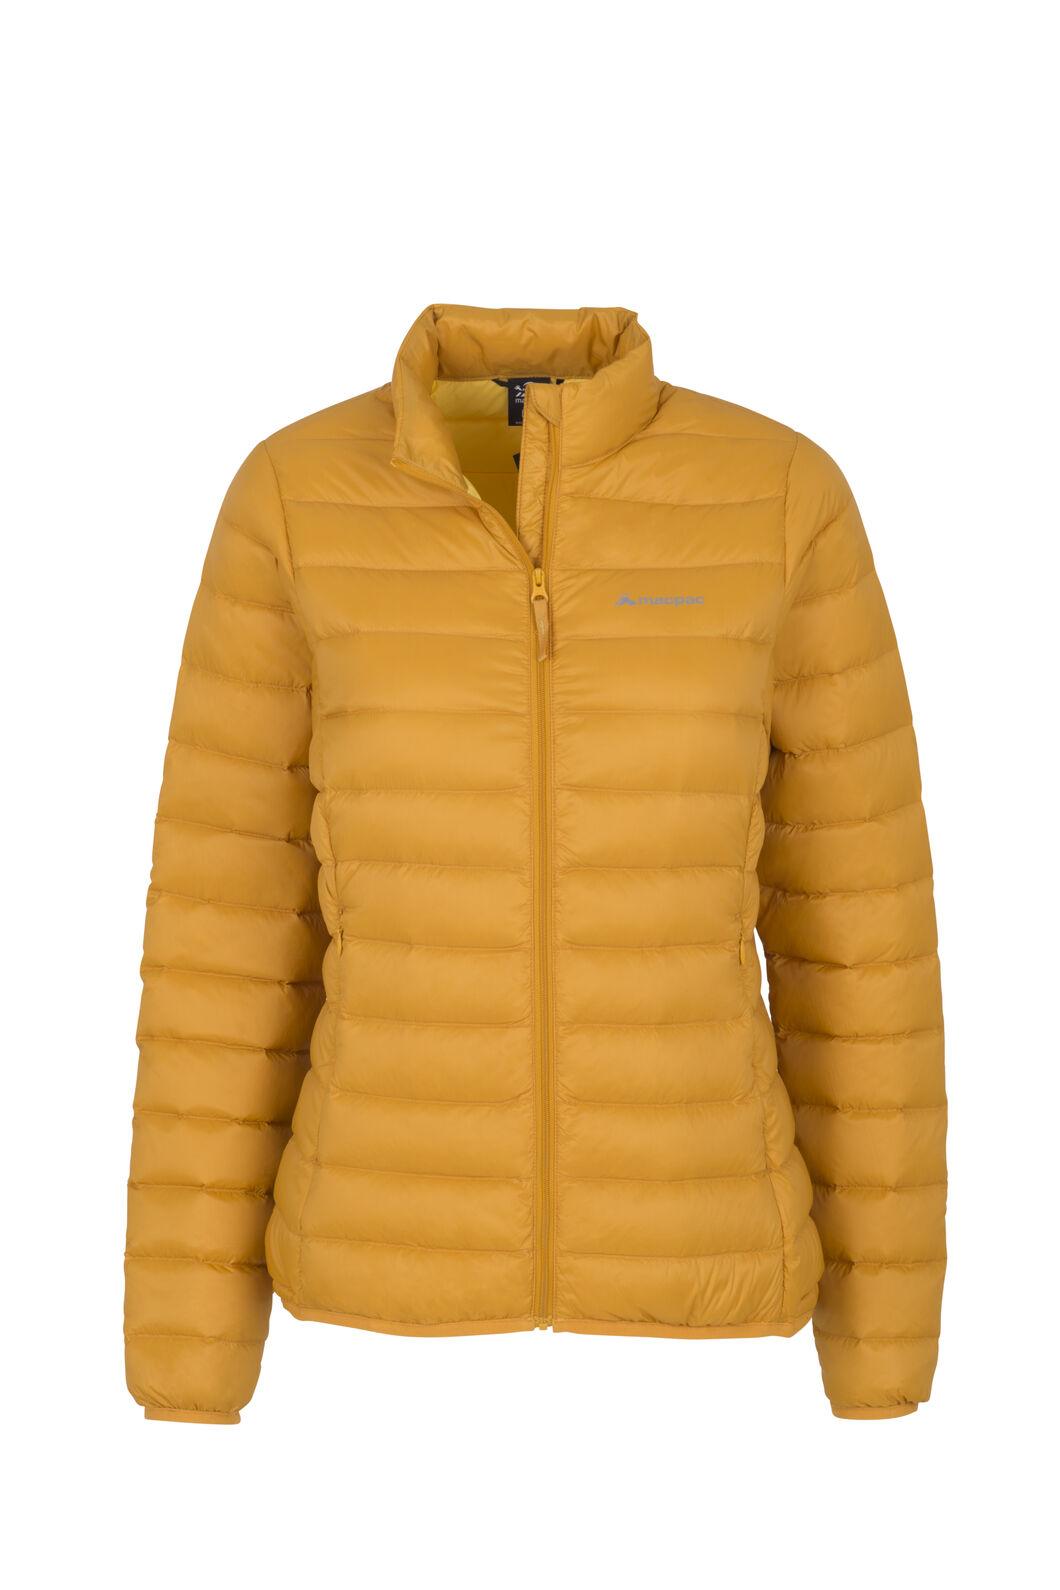 Macpac Uber Light Down Jacket - Women's, Golden Yellow, hi-res